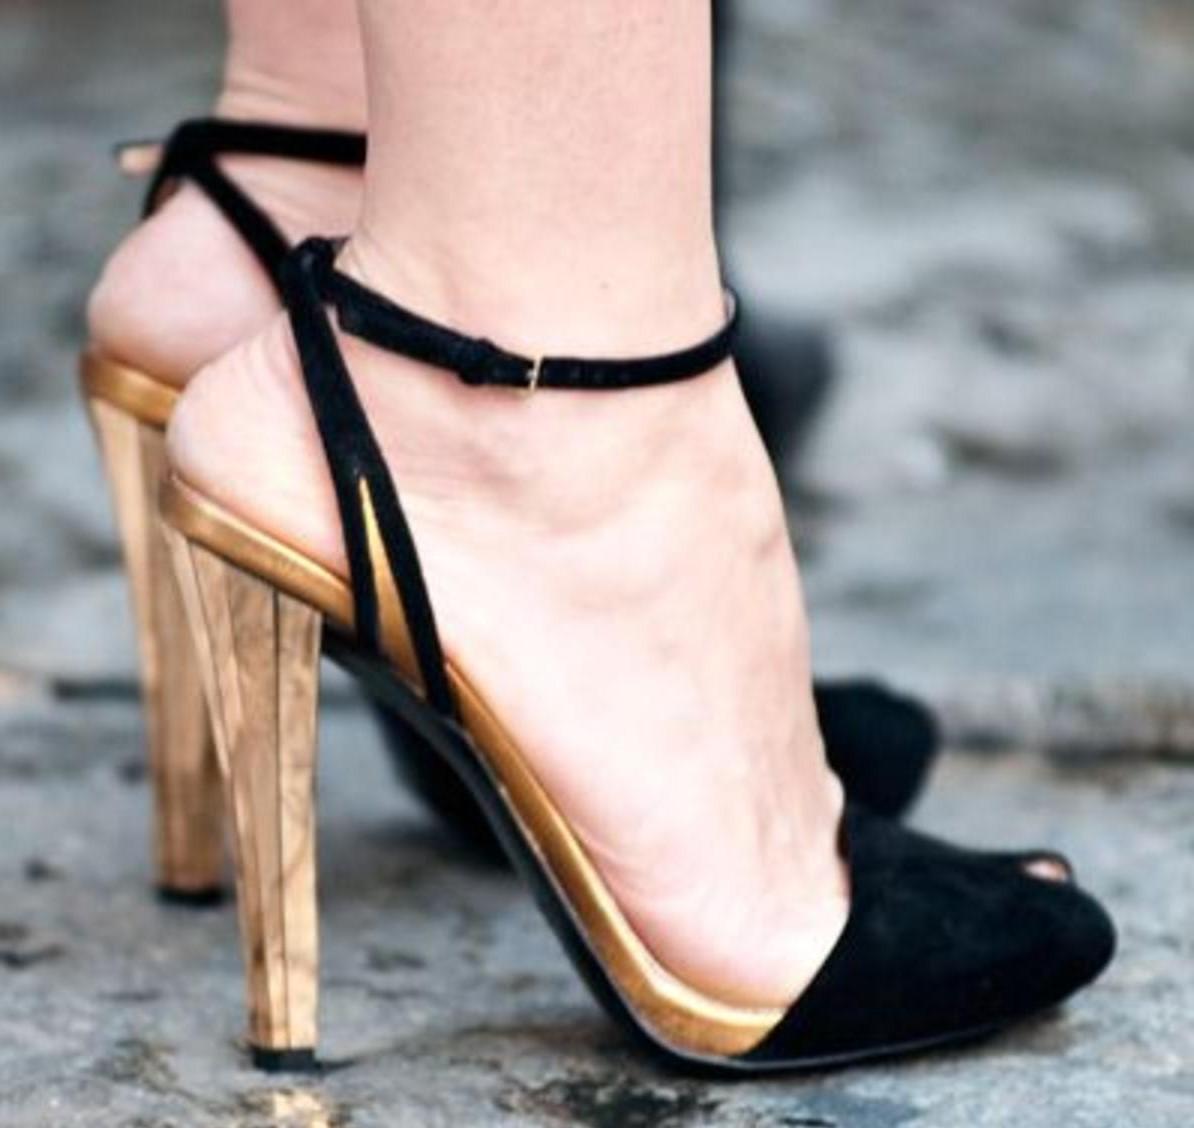 89c1e72f1 حذاء سهرة باللون الاسود و البيج | المرسال